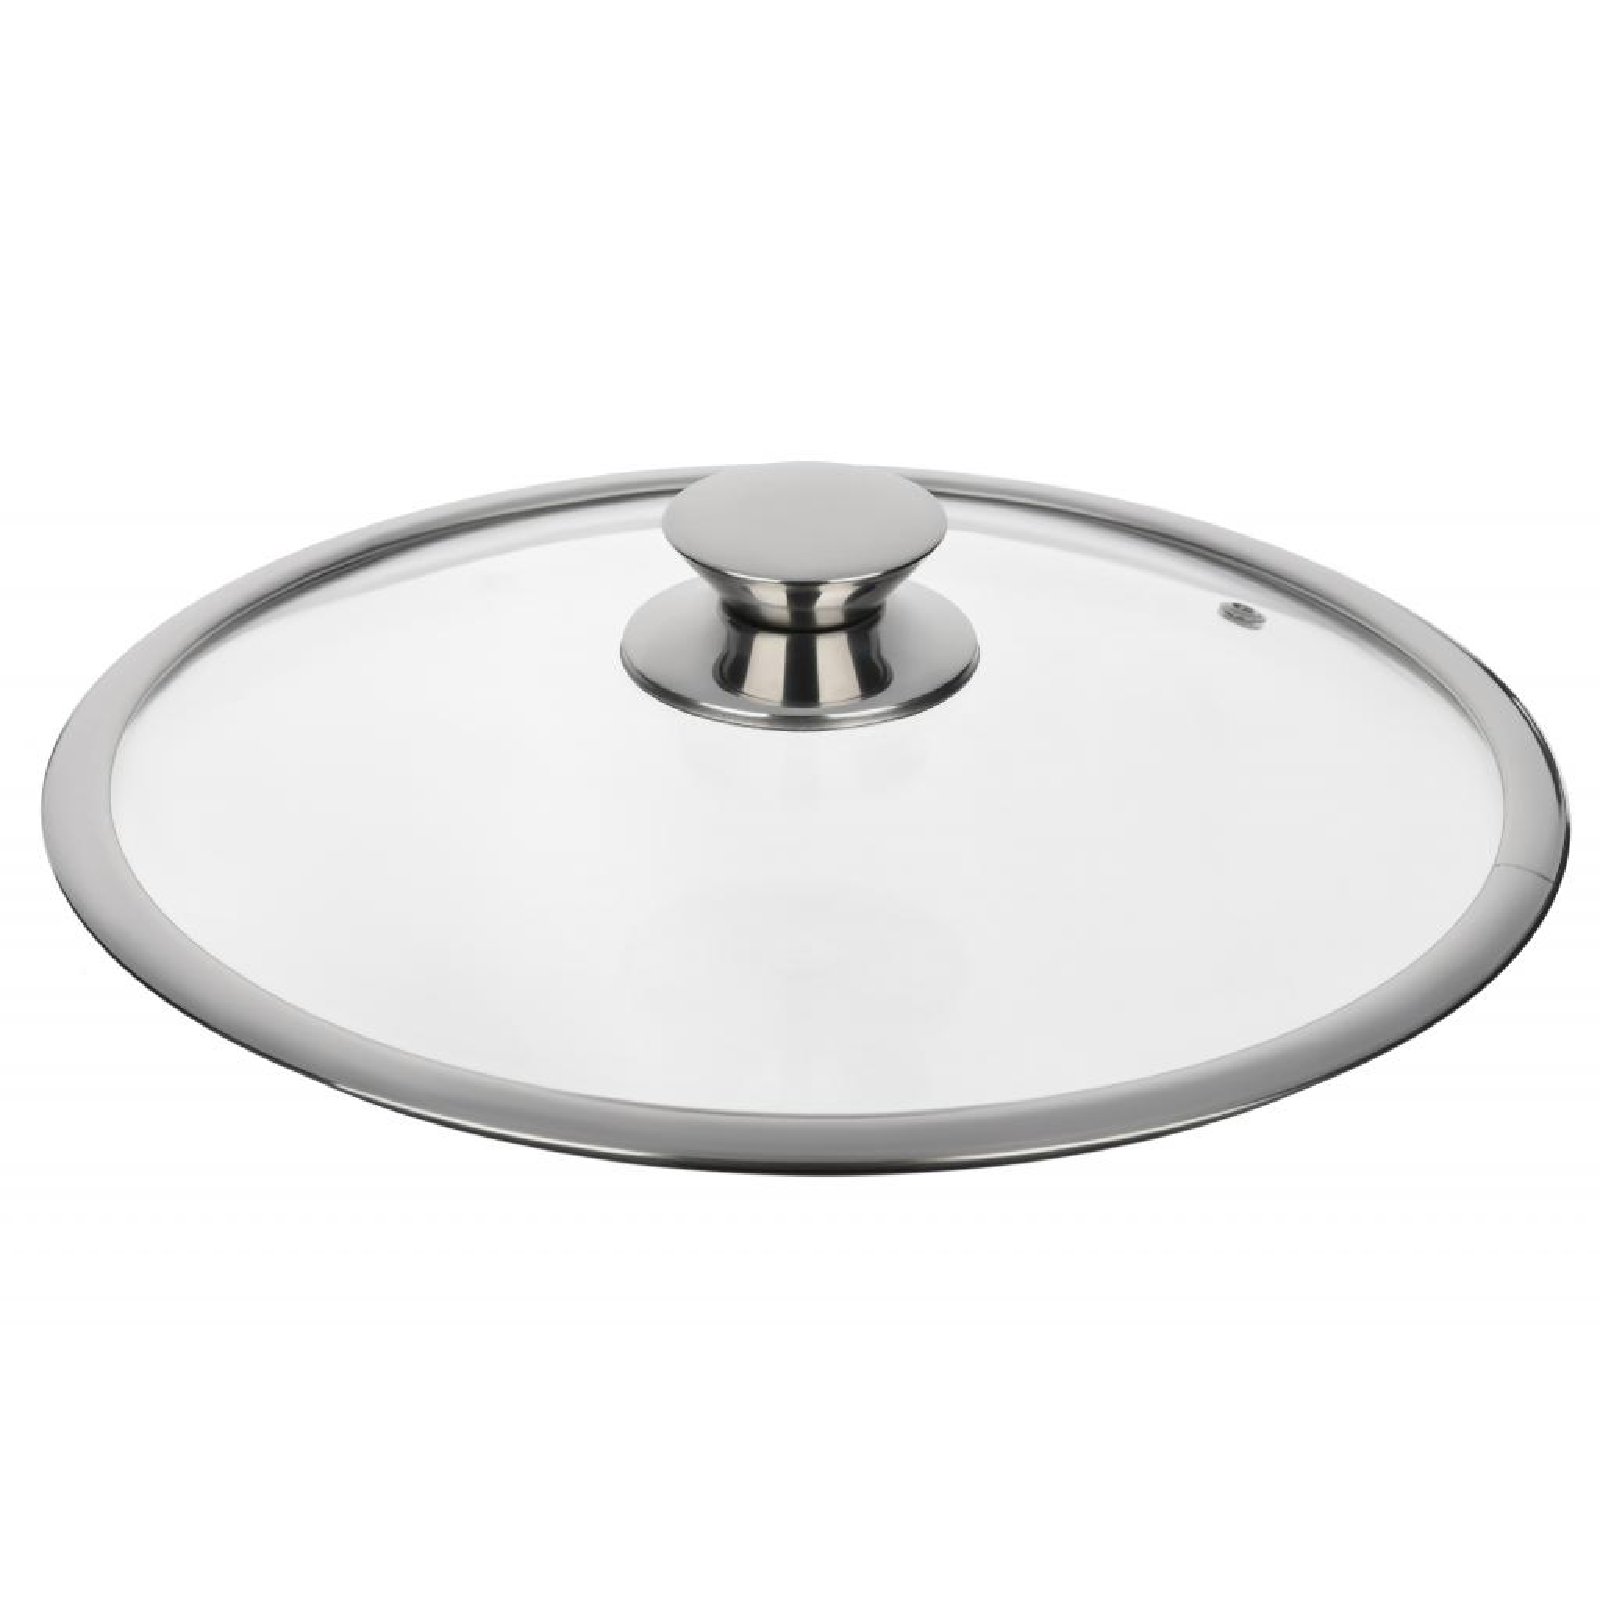 Крышка для посуды Ardesto Gemini 24 см (AR1924L)